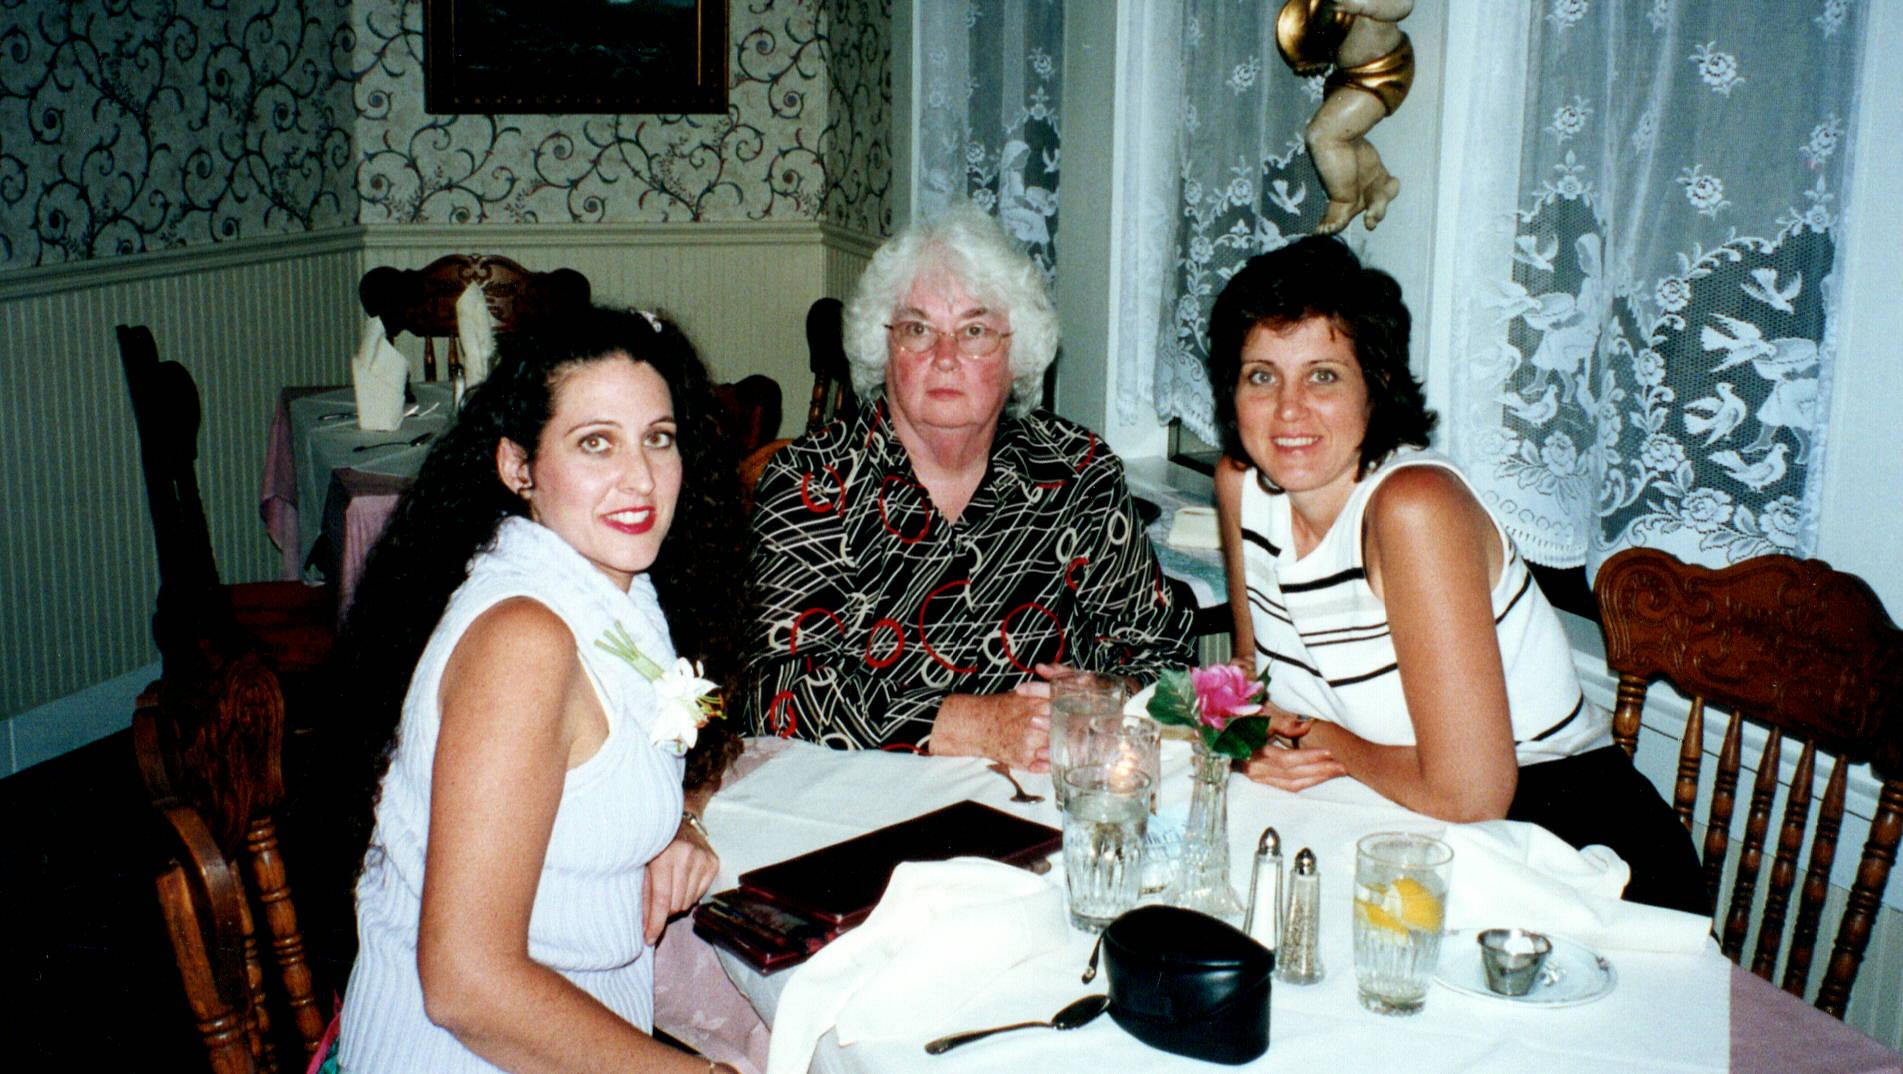 Mom, Debi and Pamela